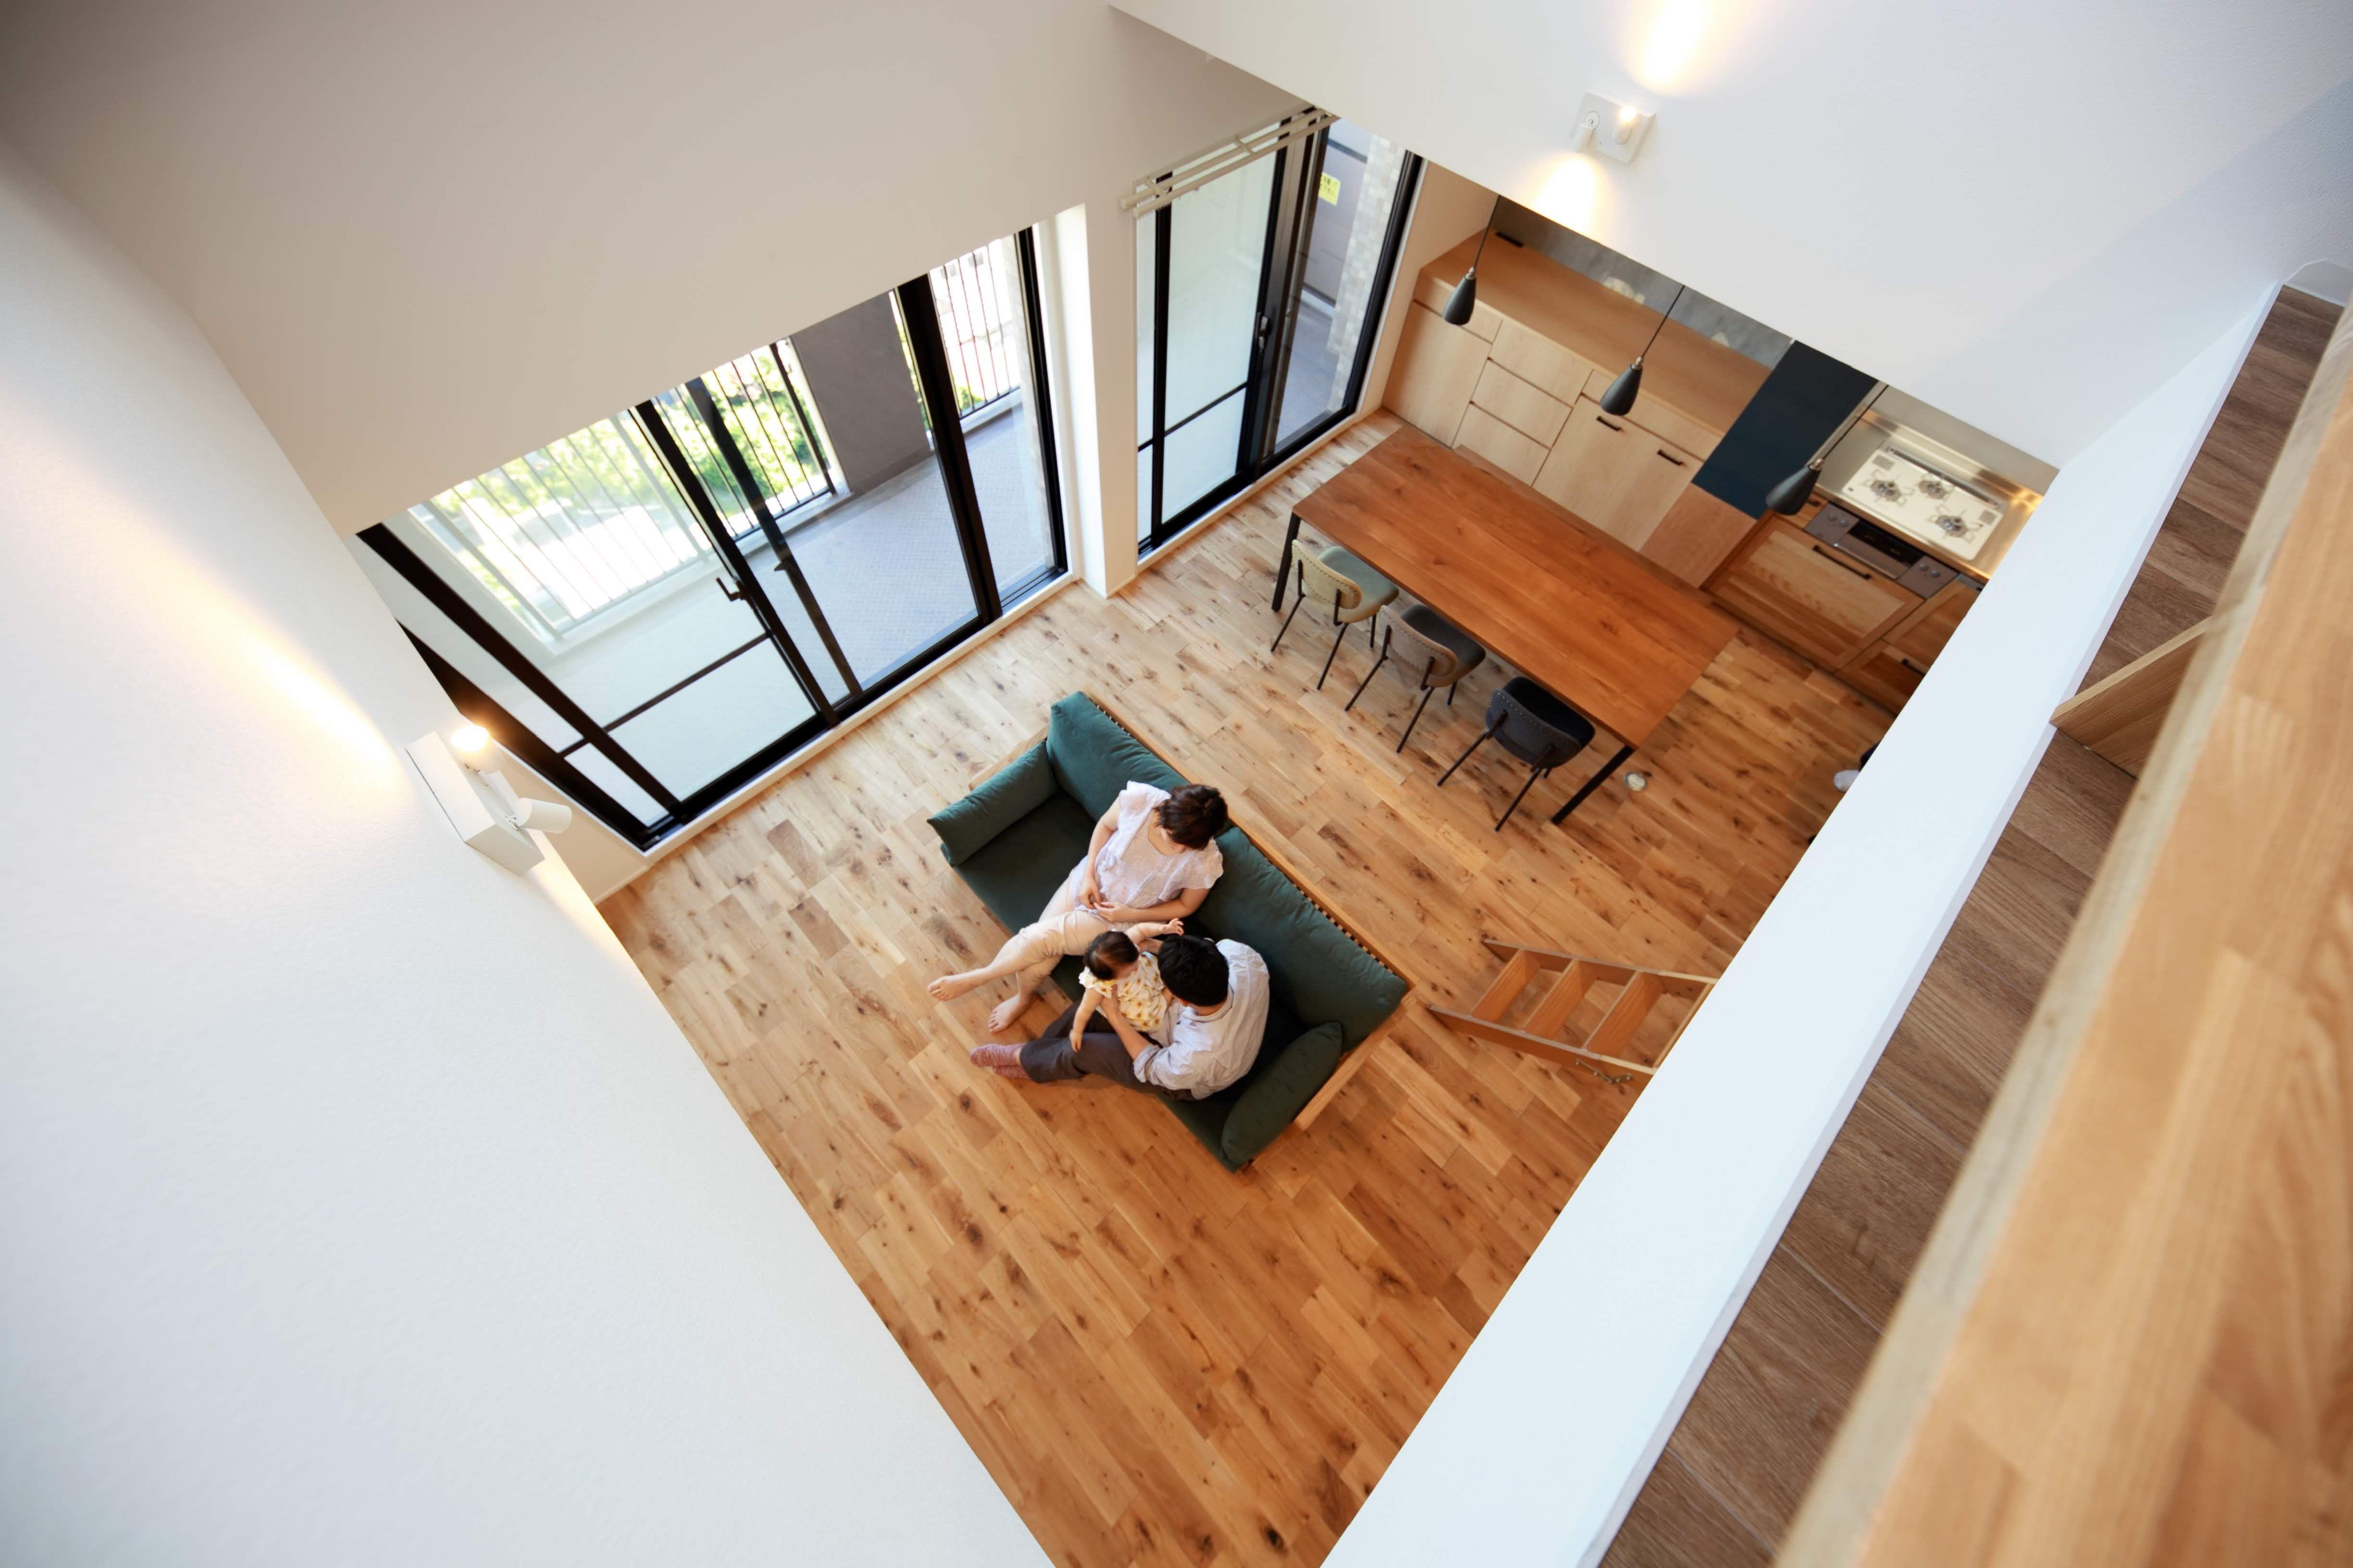 Natural Cute 無垢材 Diy塗装でオンリーワンな空間を マンション